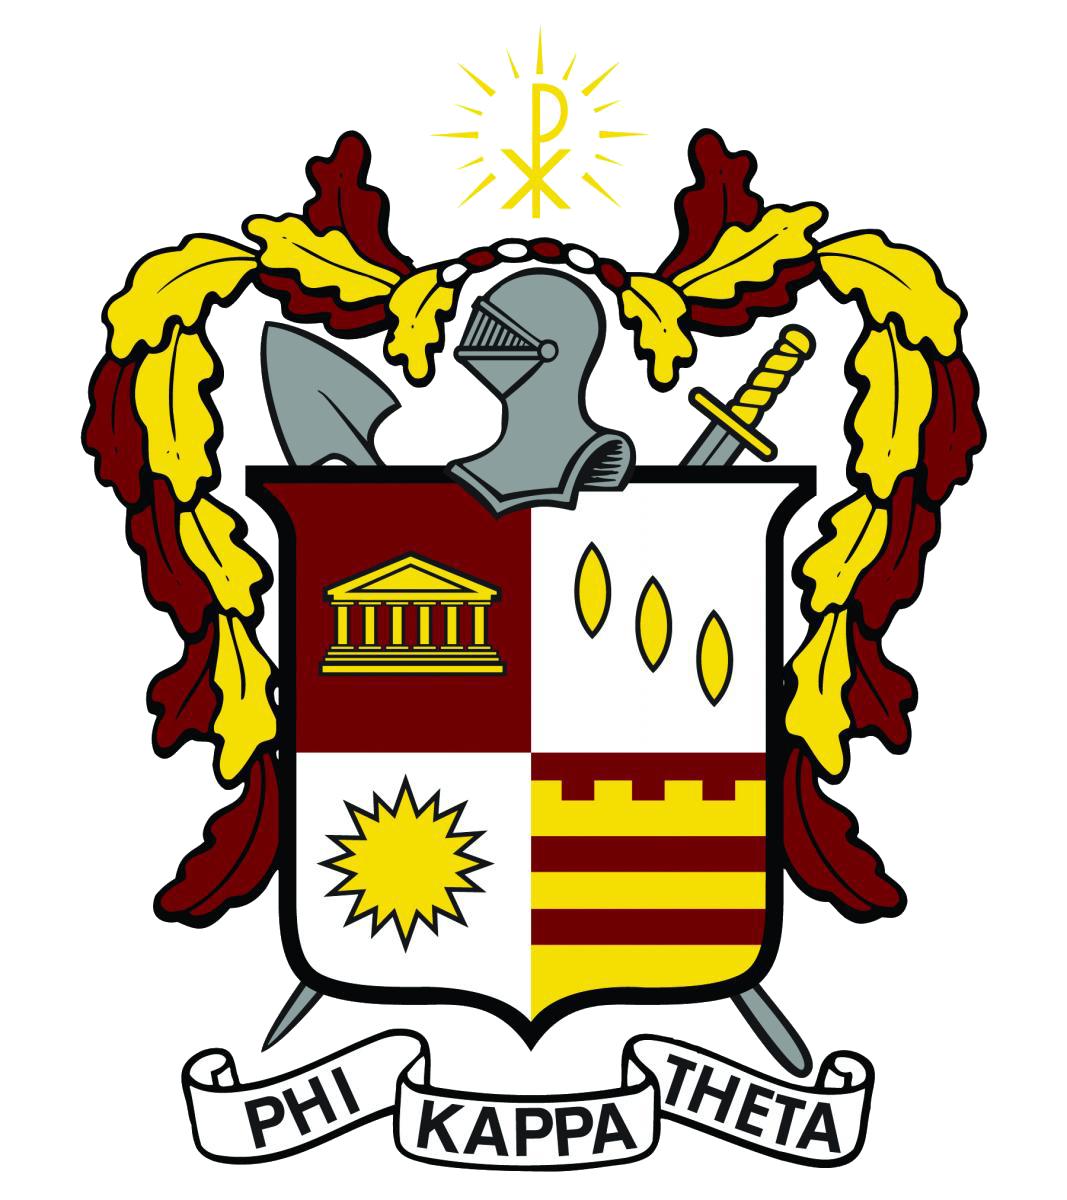 Man of faith scholarship phi kappa theta kansas state univerisity phi kappa theta kansas state univerisity buycottarizona